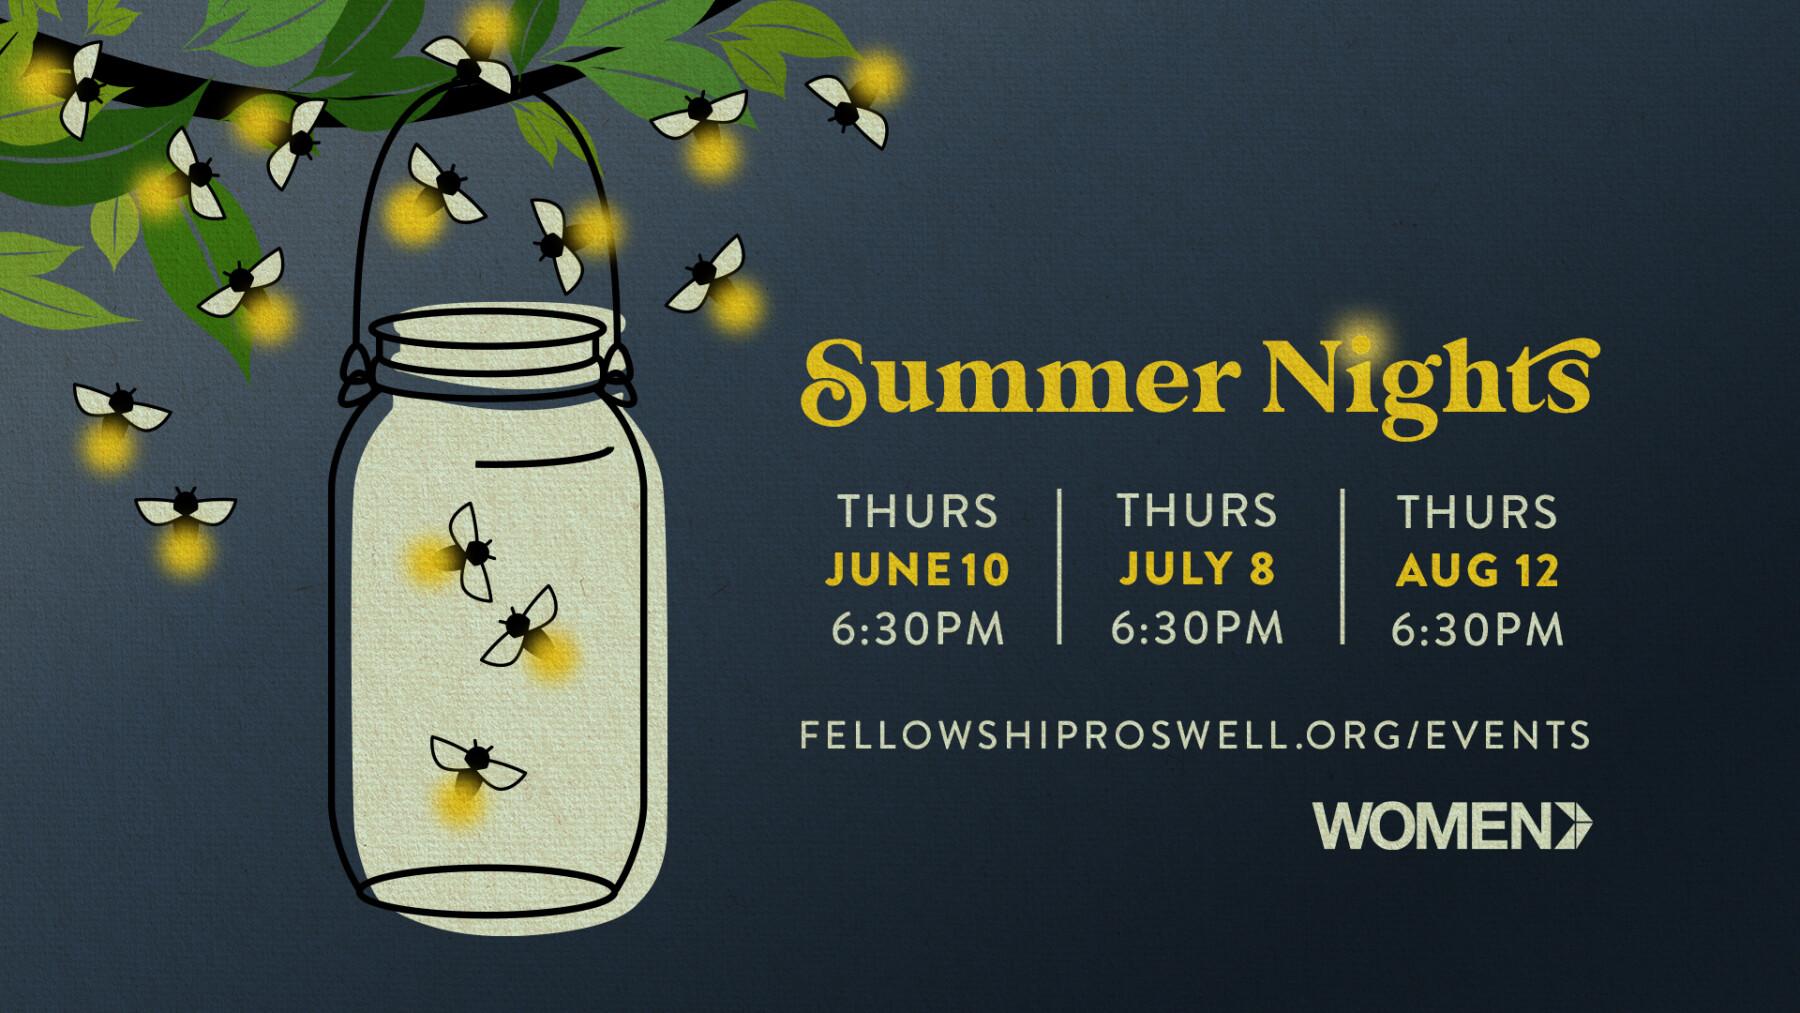 Women's Summer Nights